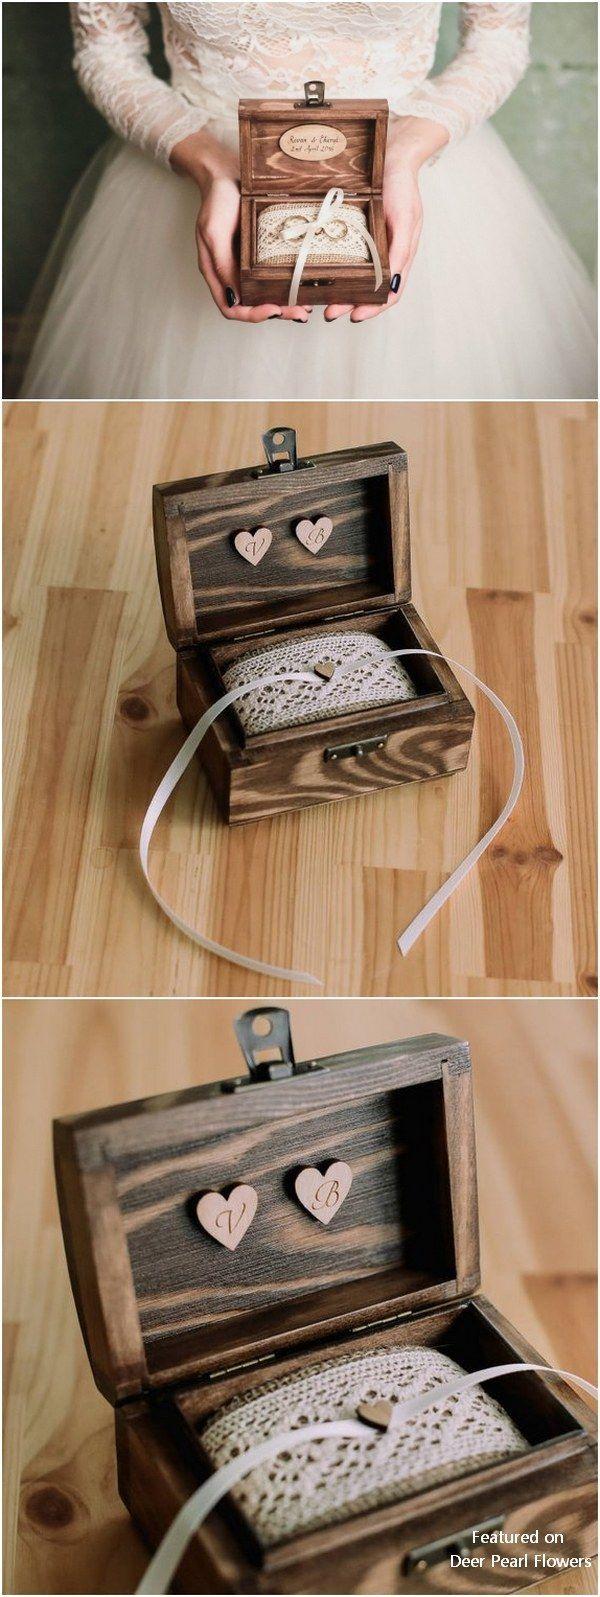 TOP 16 Holz Ehering Box Ideen von Etsy   - V+A - #Box #Ehering #Etsy #Holz #Ideen #Top #von #caixasdemadeira